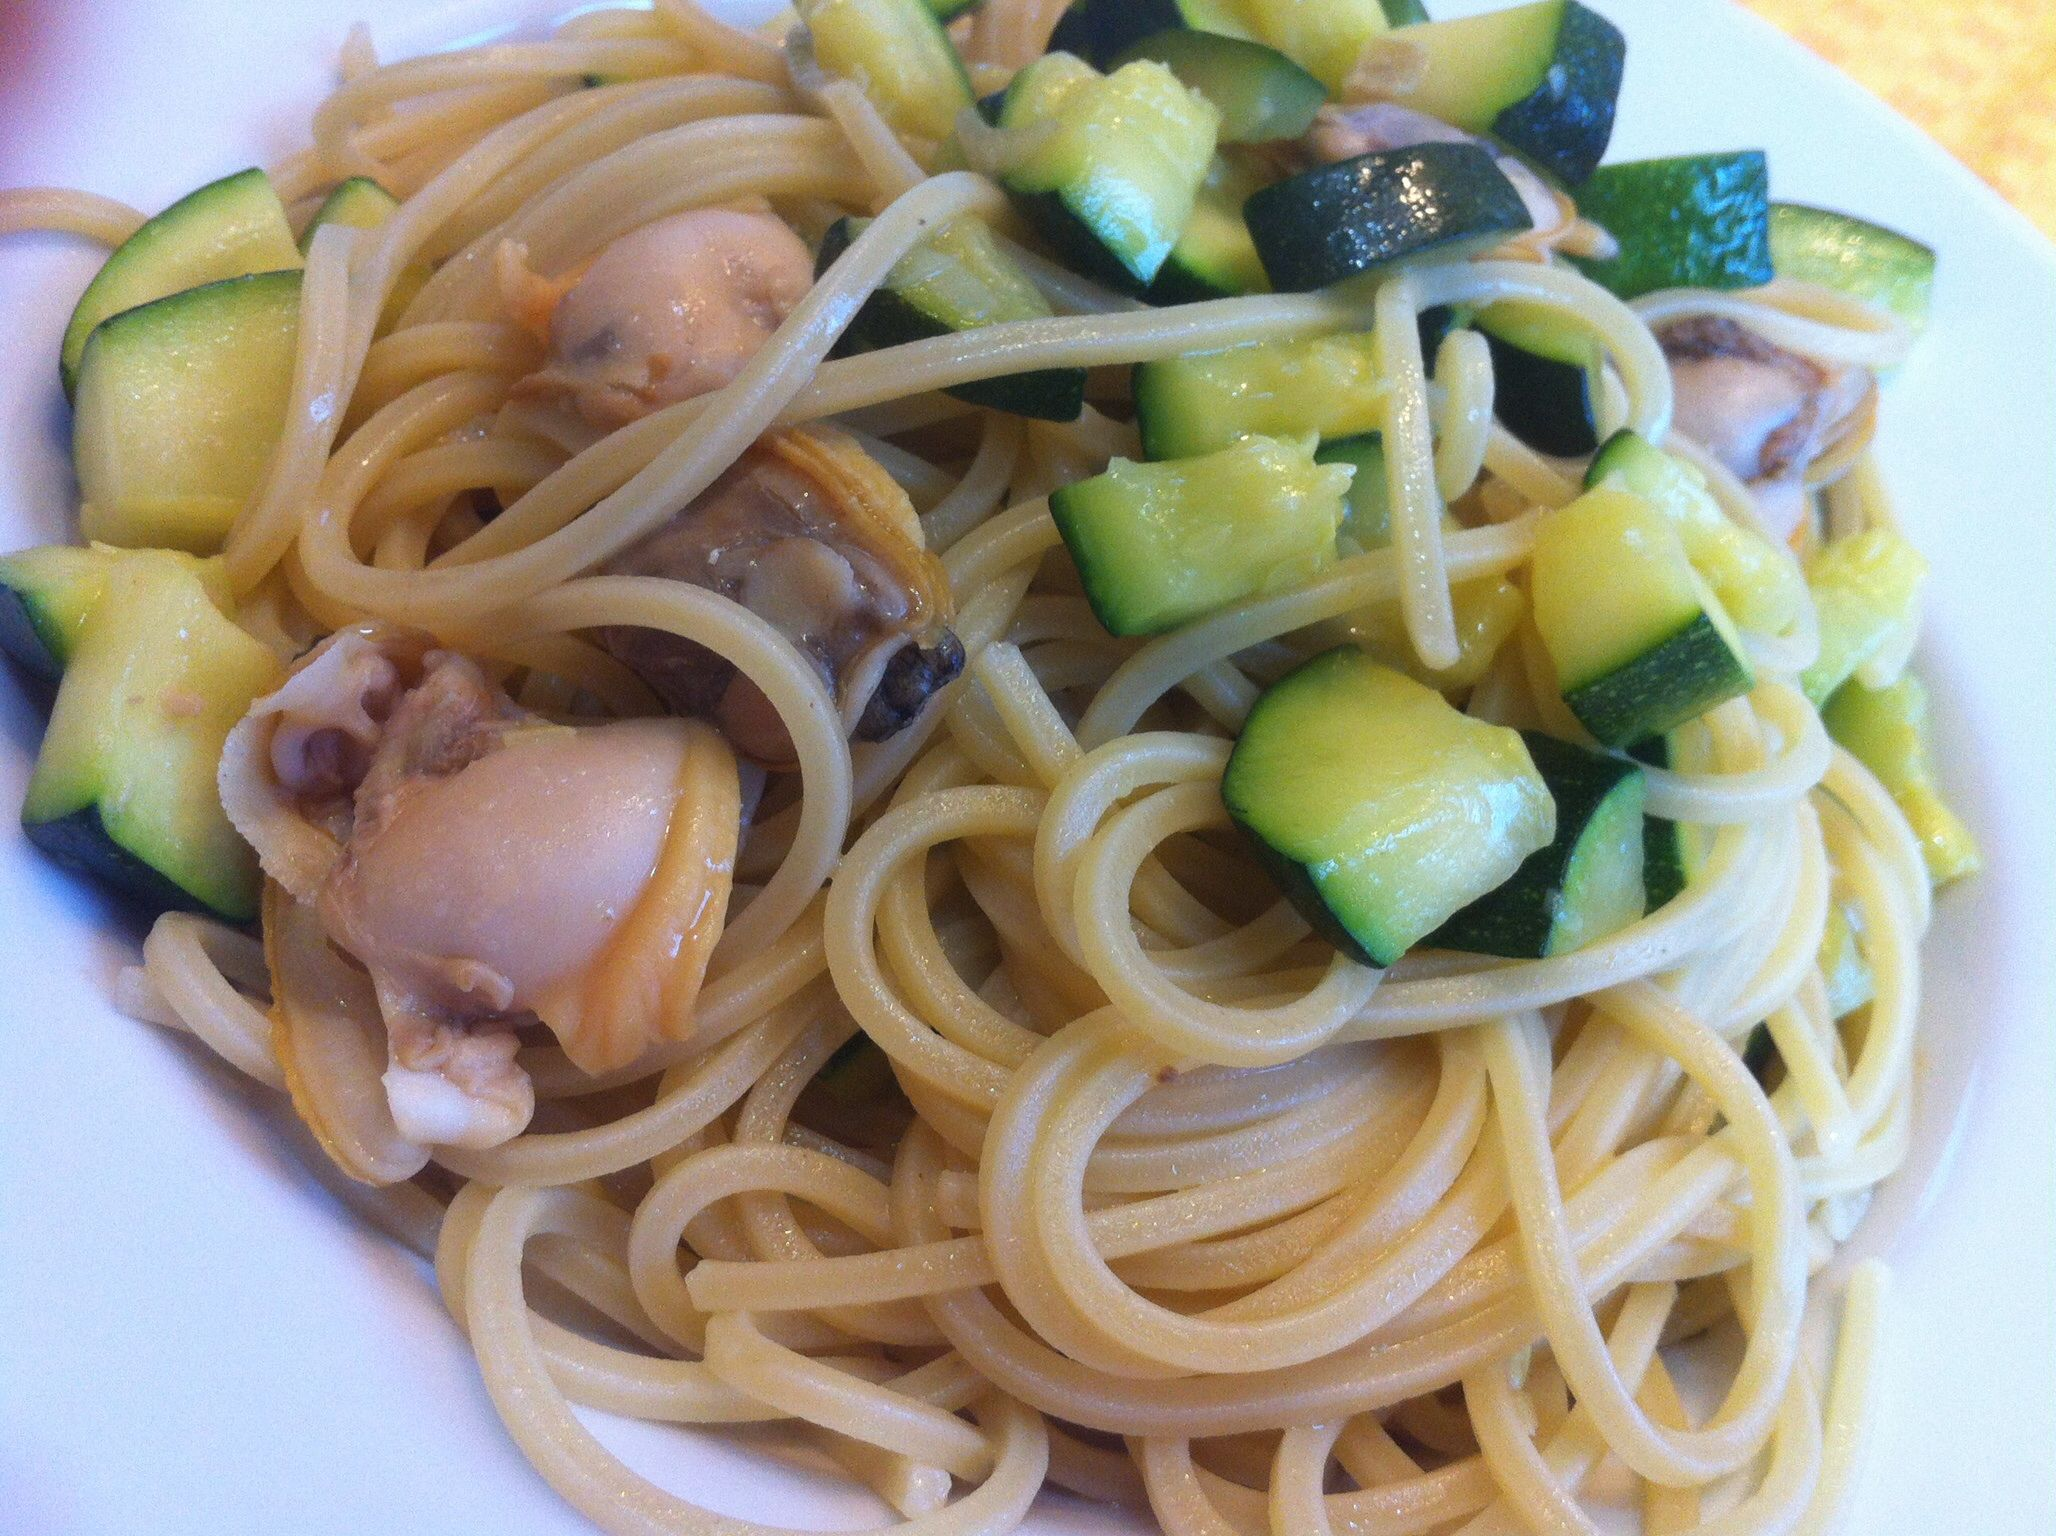 Pasta with Clams, Zucchini, and Zucchini Blossoms